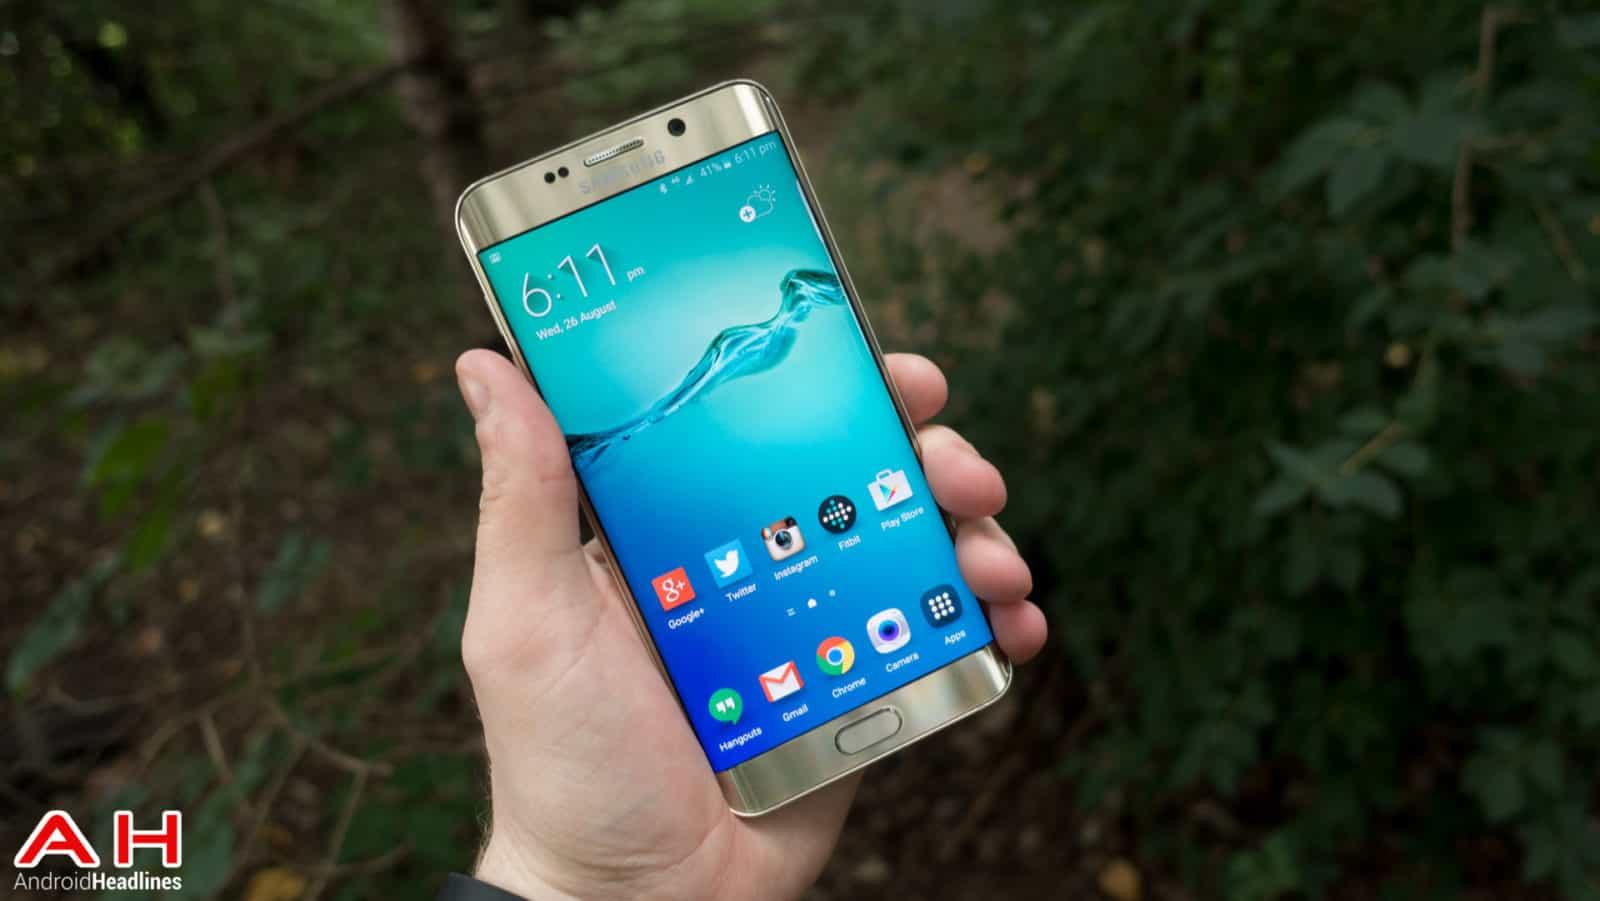 Sturdy Europe Galaxy Edge Europe Samsung Galaxy S6 Edge Vs S6 Edge Galaxy Edge Galaxy S6 Edge Vs S6 Edge Plus Receives Android Nougat Update Receives Android Nougat Update dpreview S6 Edge Vs S6 Edge Plus